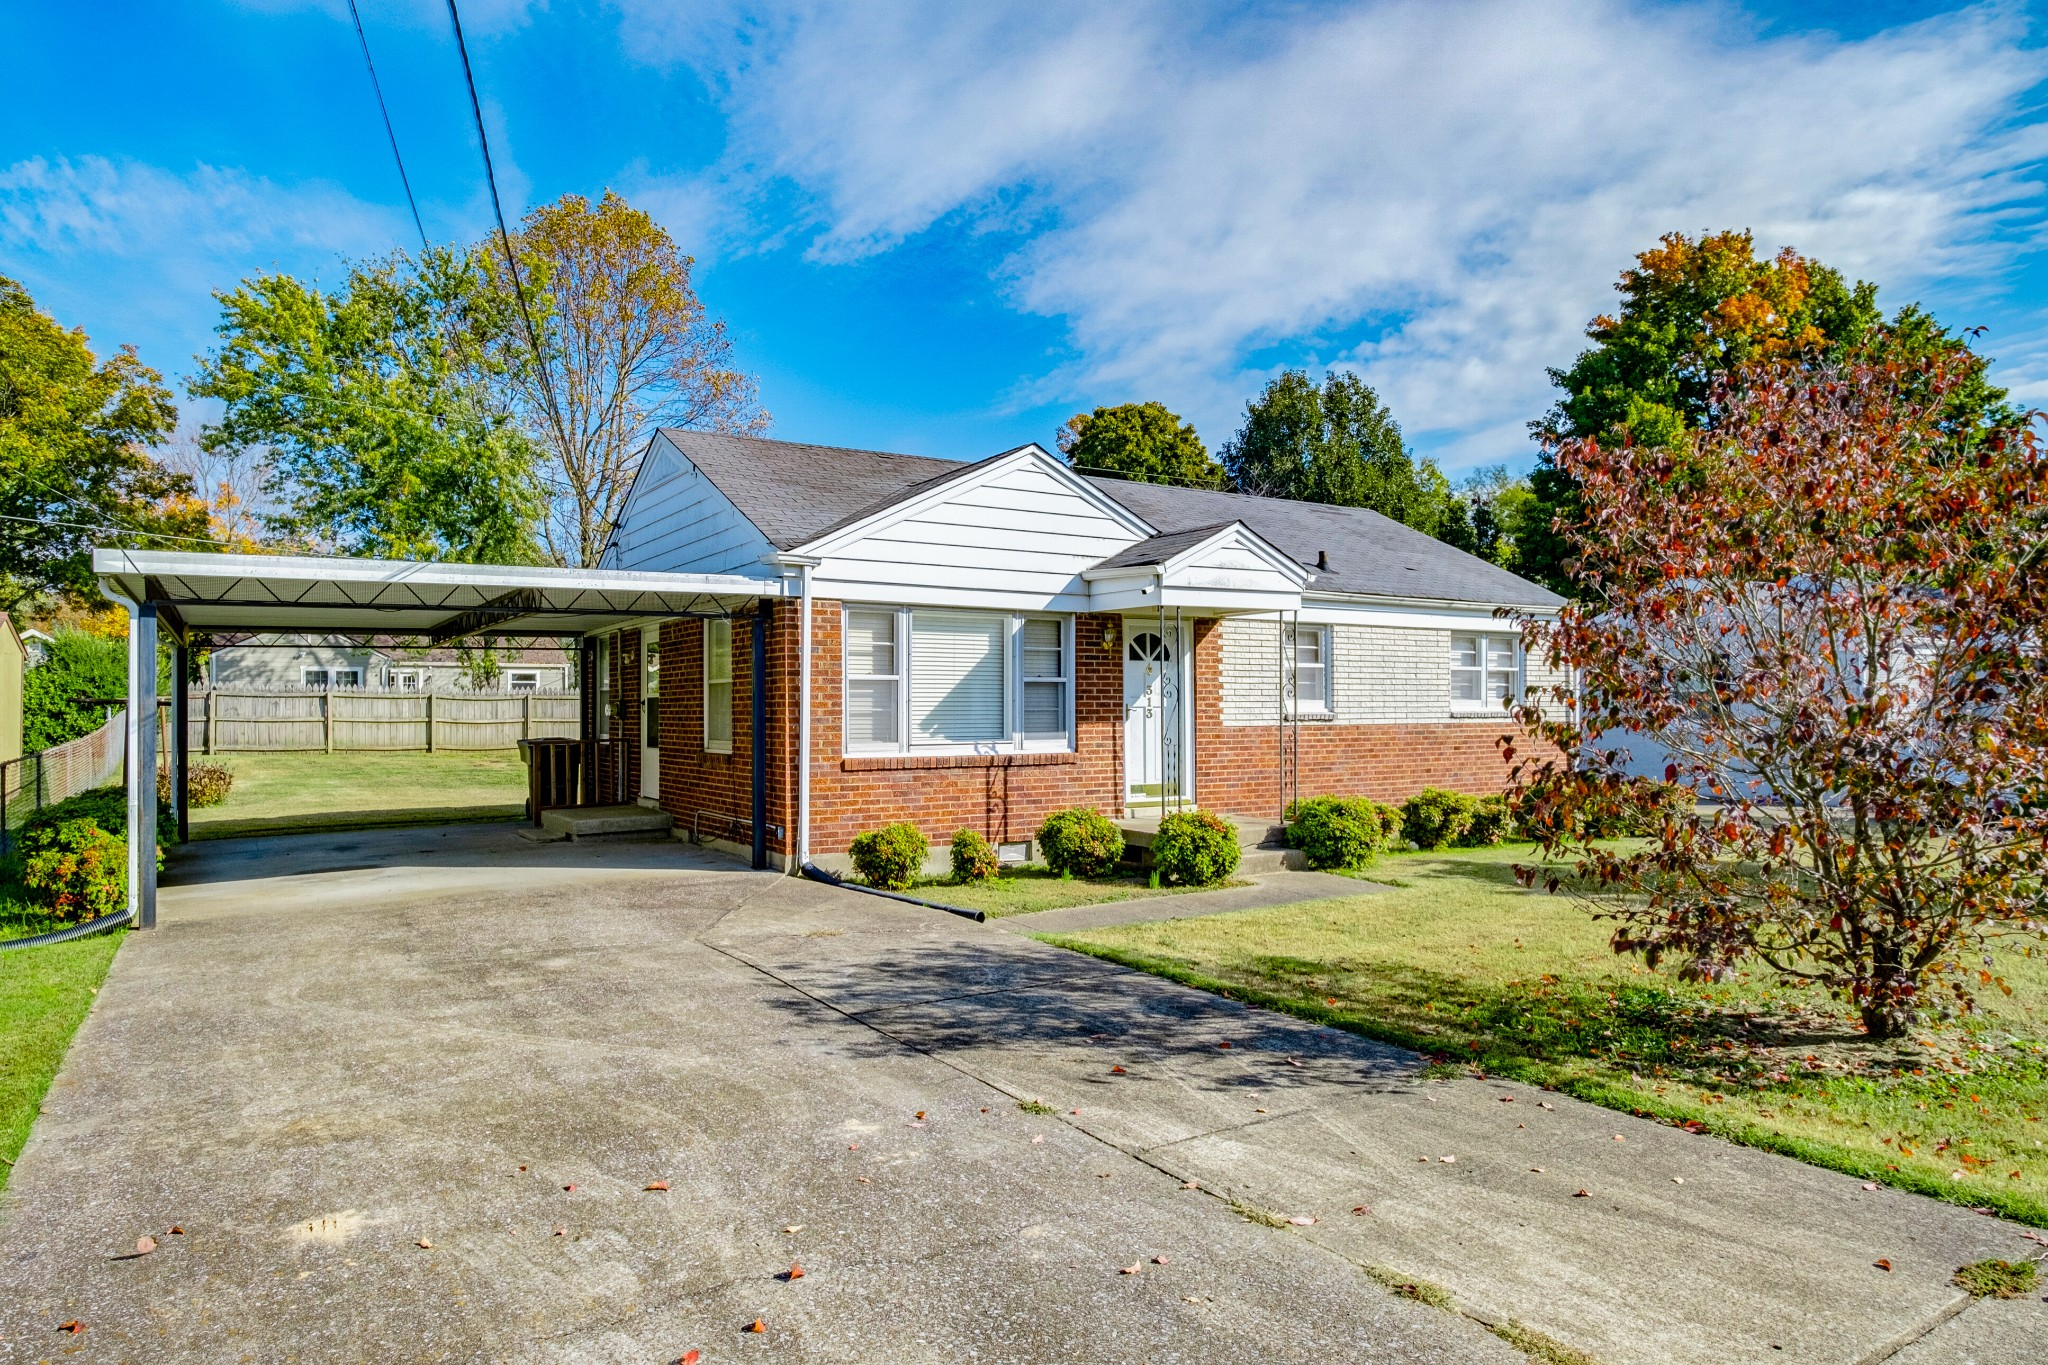 313 James Ave Property Photo - Franklin, TN real estate listing